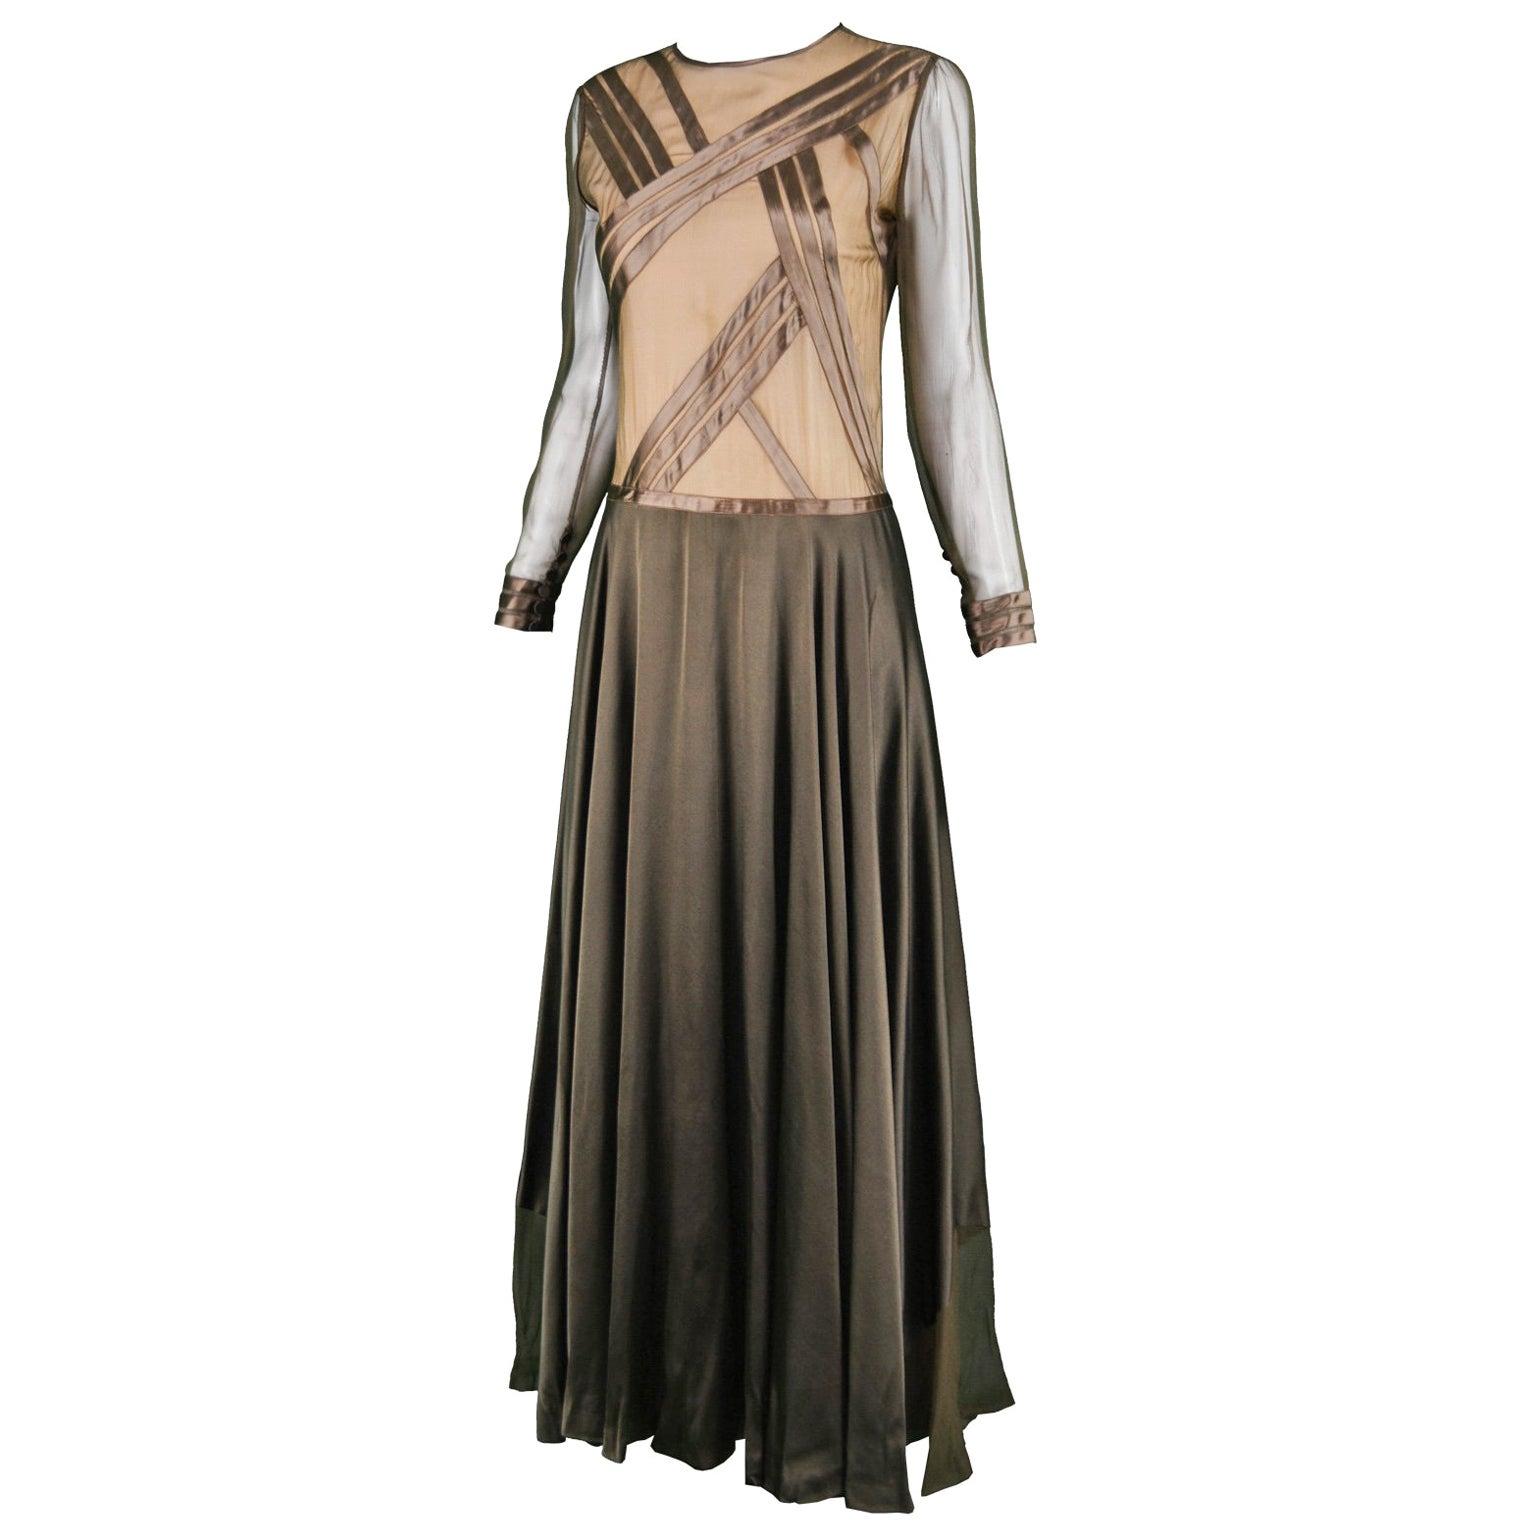 Louis Feraud Haute Couture Brown Sheer Silk Chiffon / Bias Cut Satin Gown, 1970s